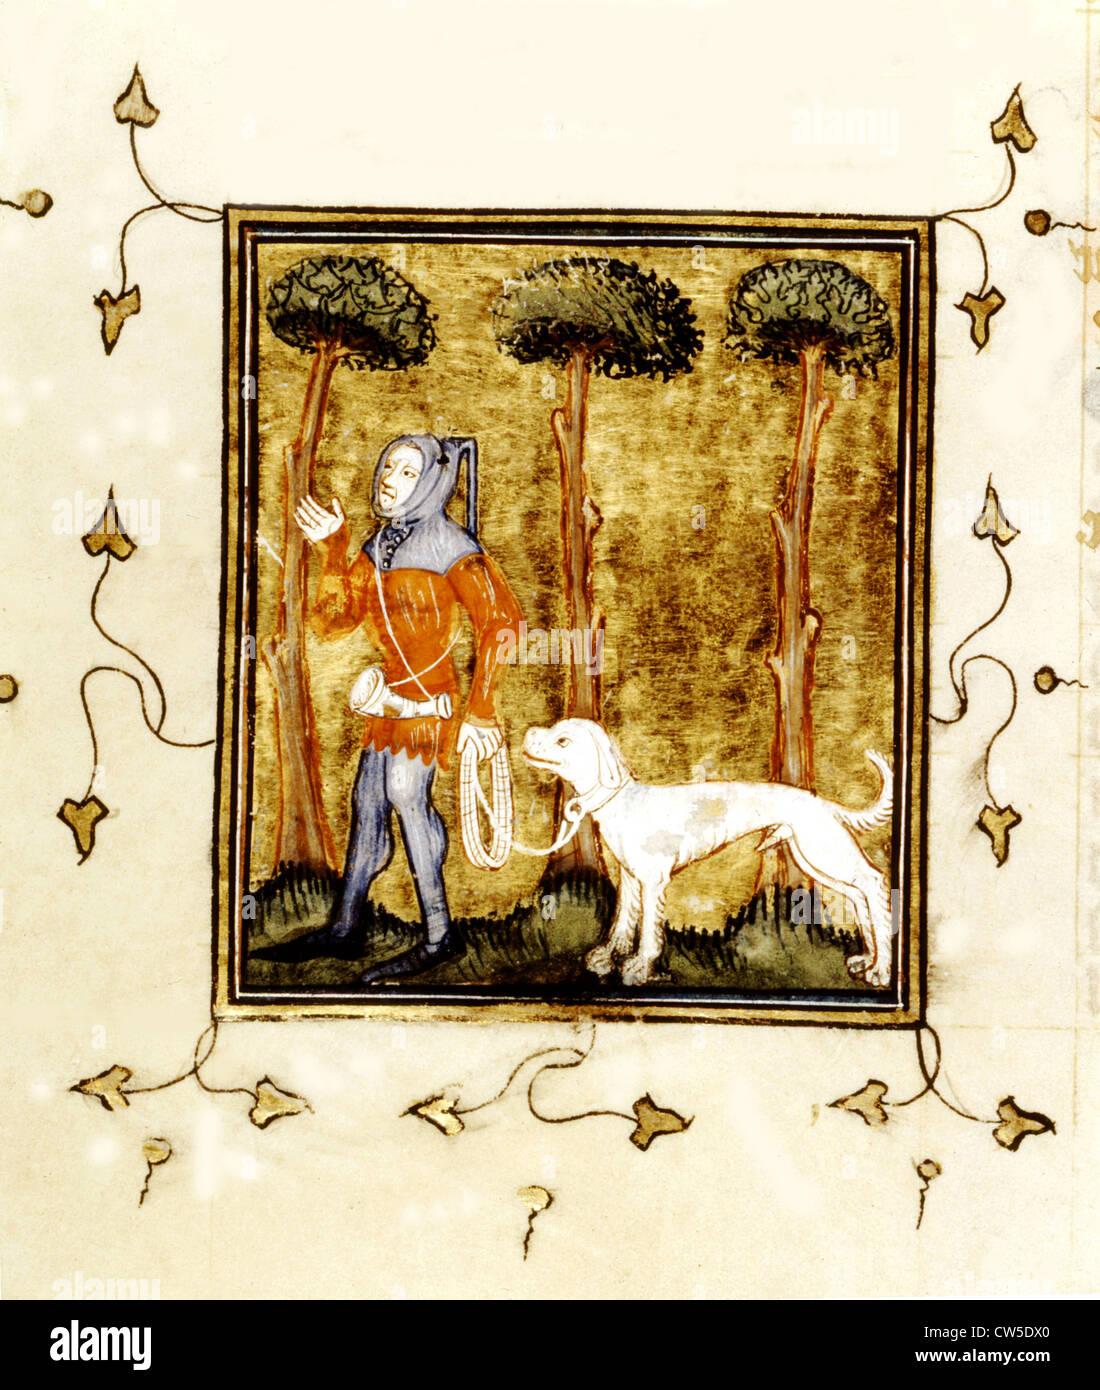 Miniature from the 'Livre du roi Modus' (King Modus's book). Hunter. - Stock Image